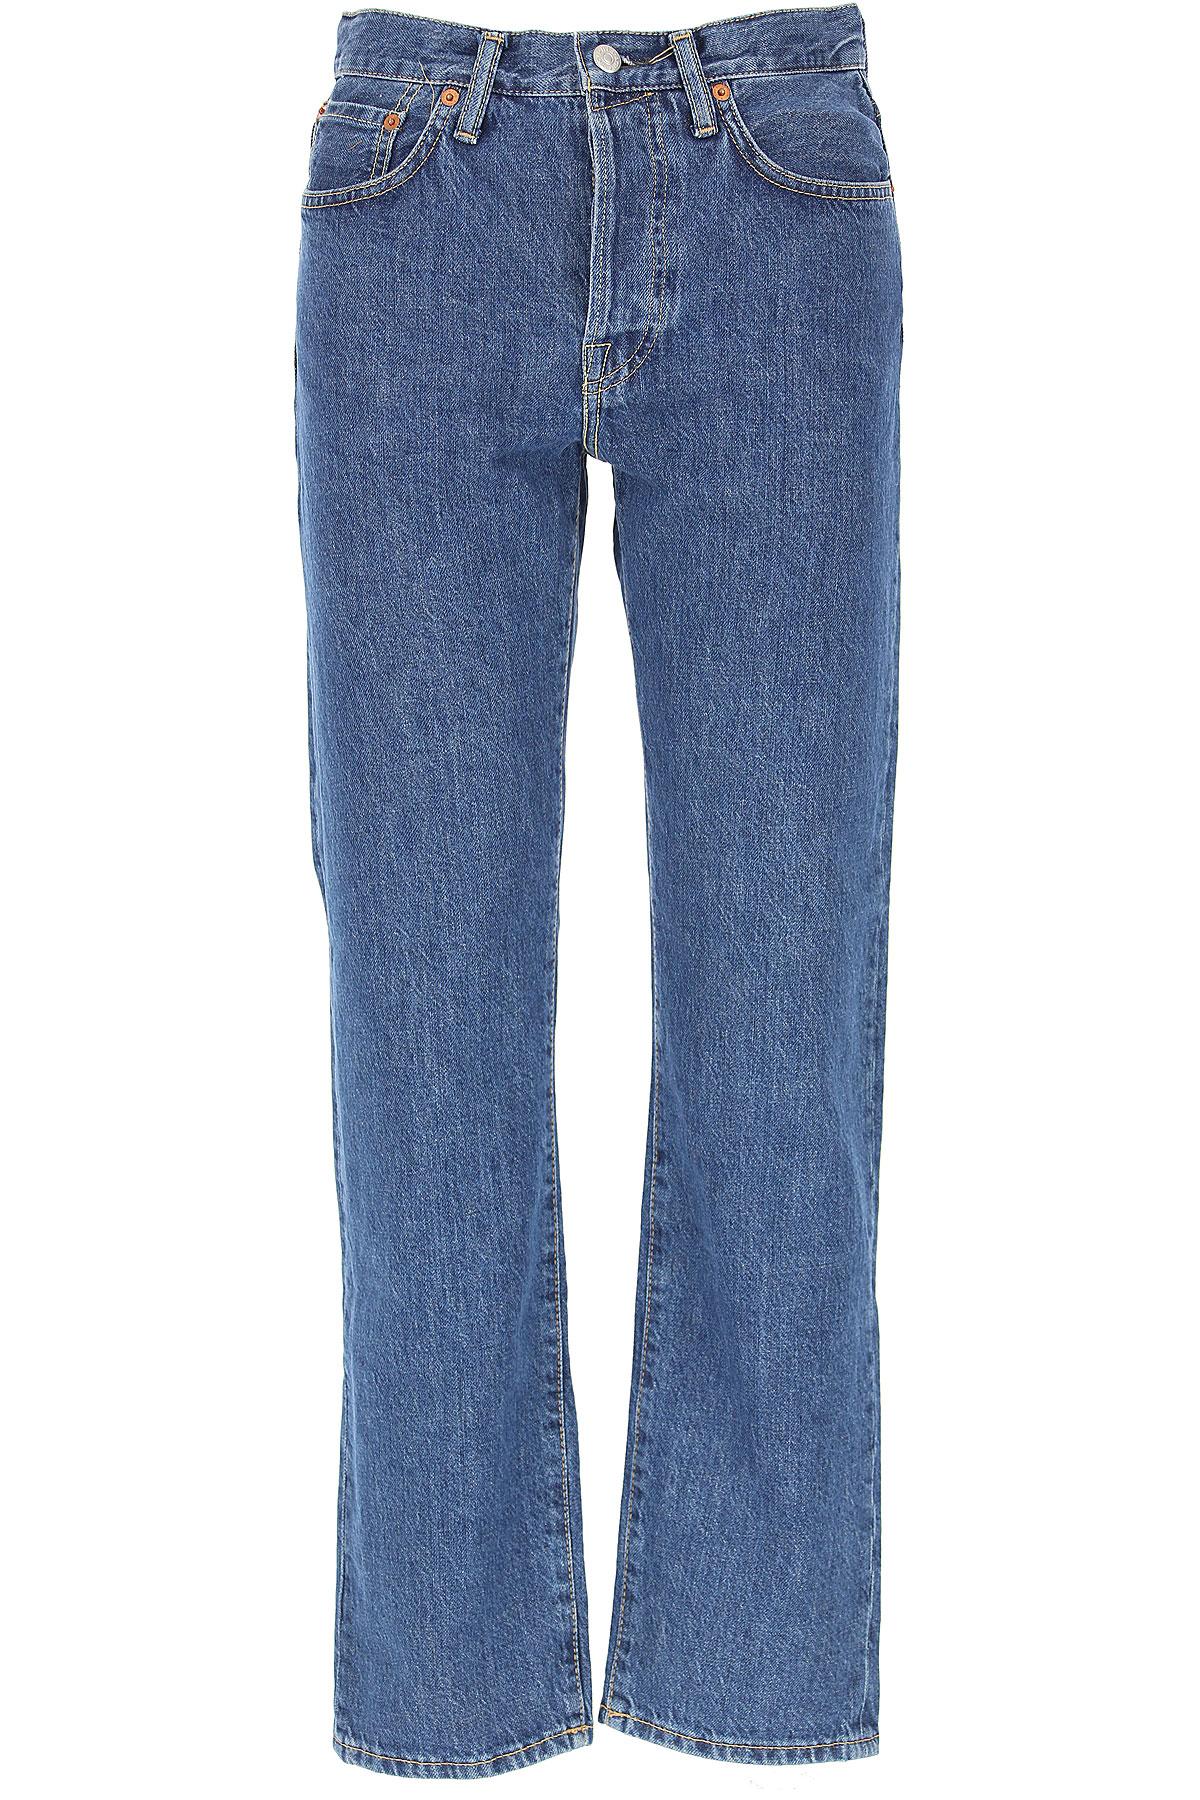 Image of Acne Studios Jeans, Dark Blue, Cotton, 2017, 25 27 29